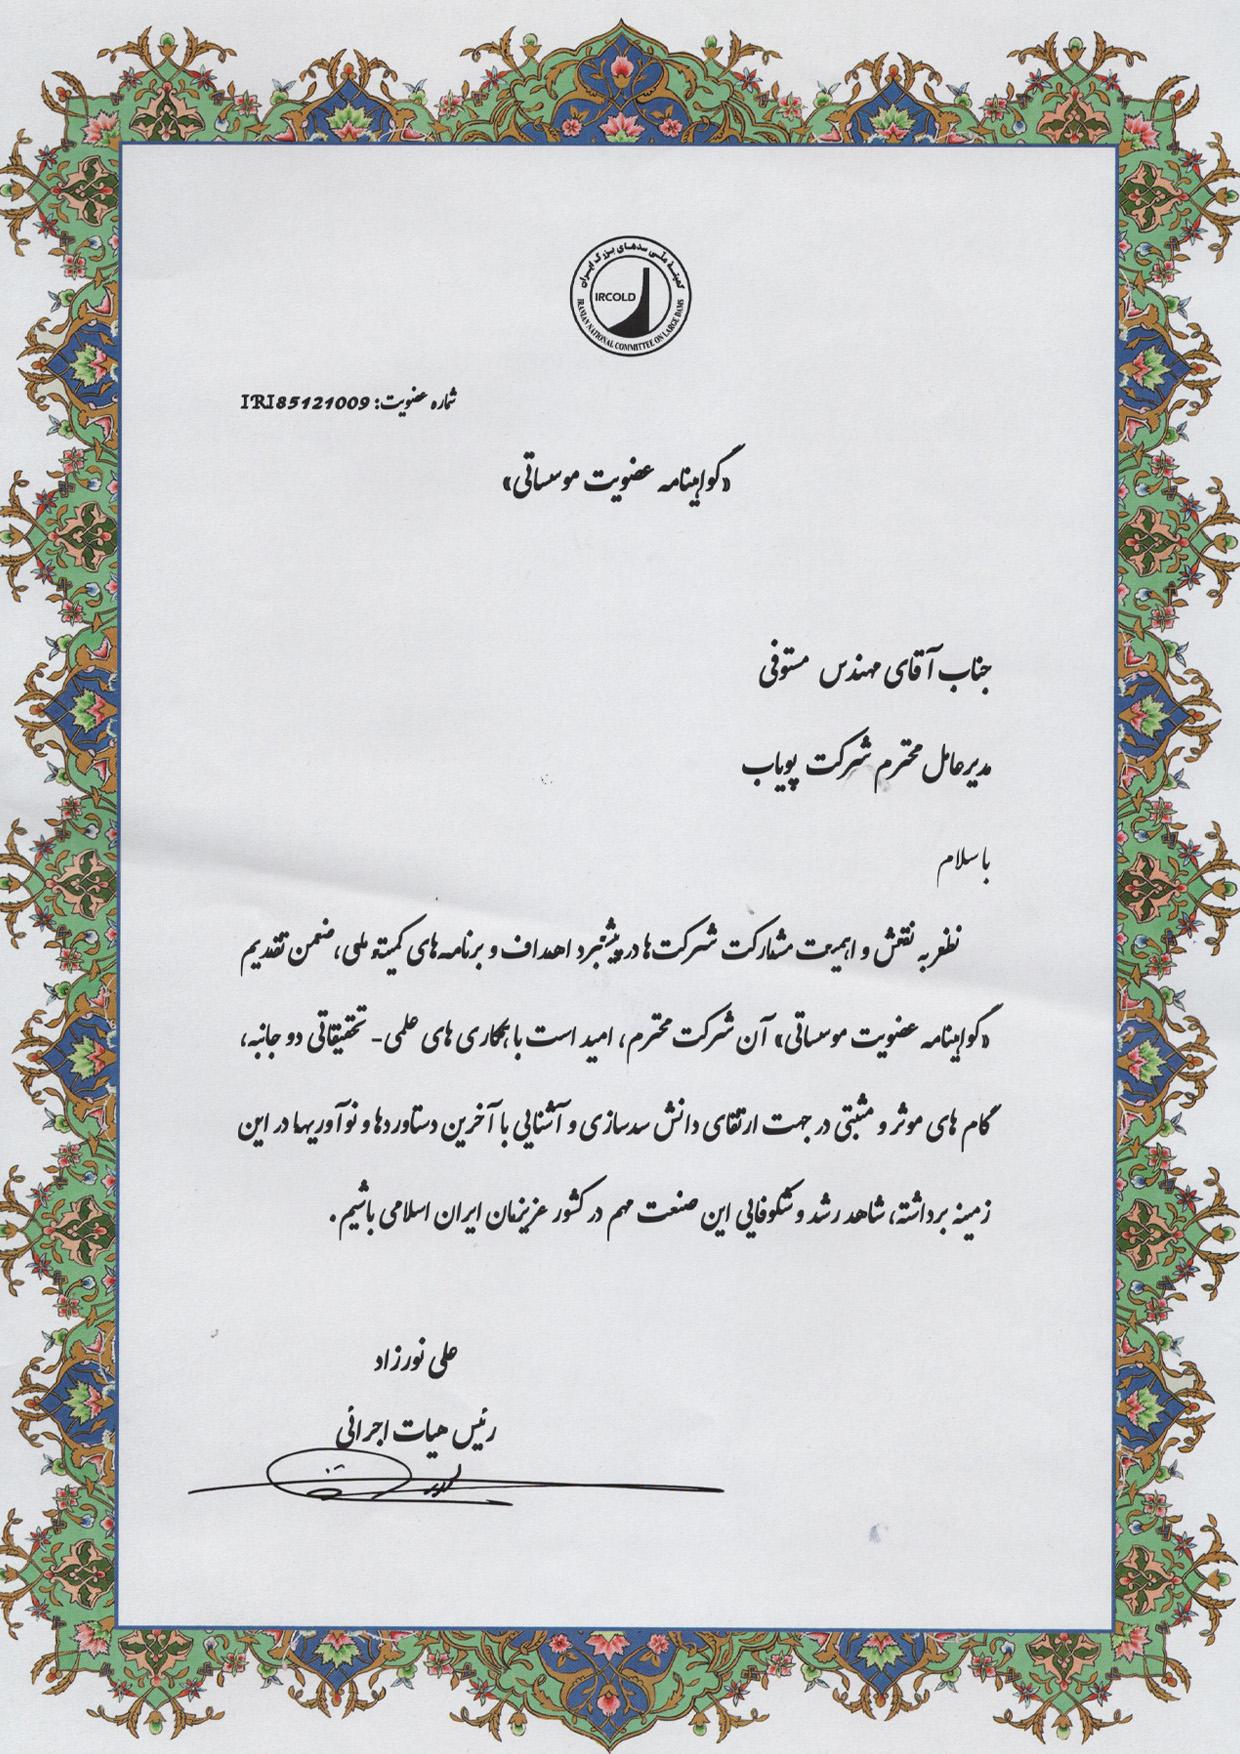 CRTF-MembershipOfInstitutions-Pooyab